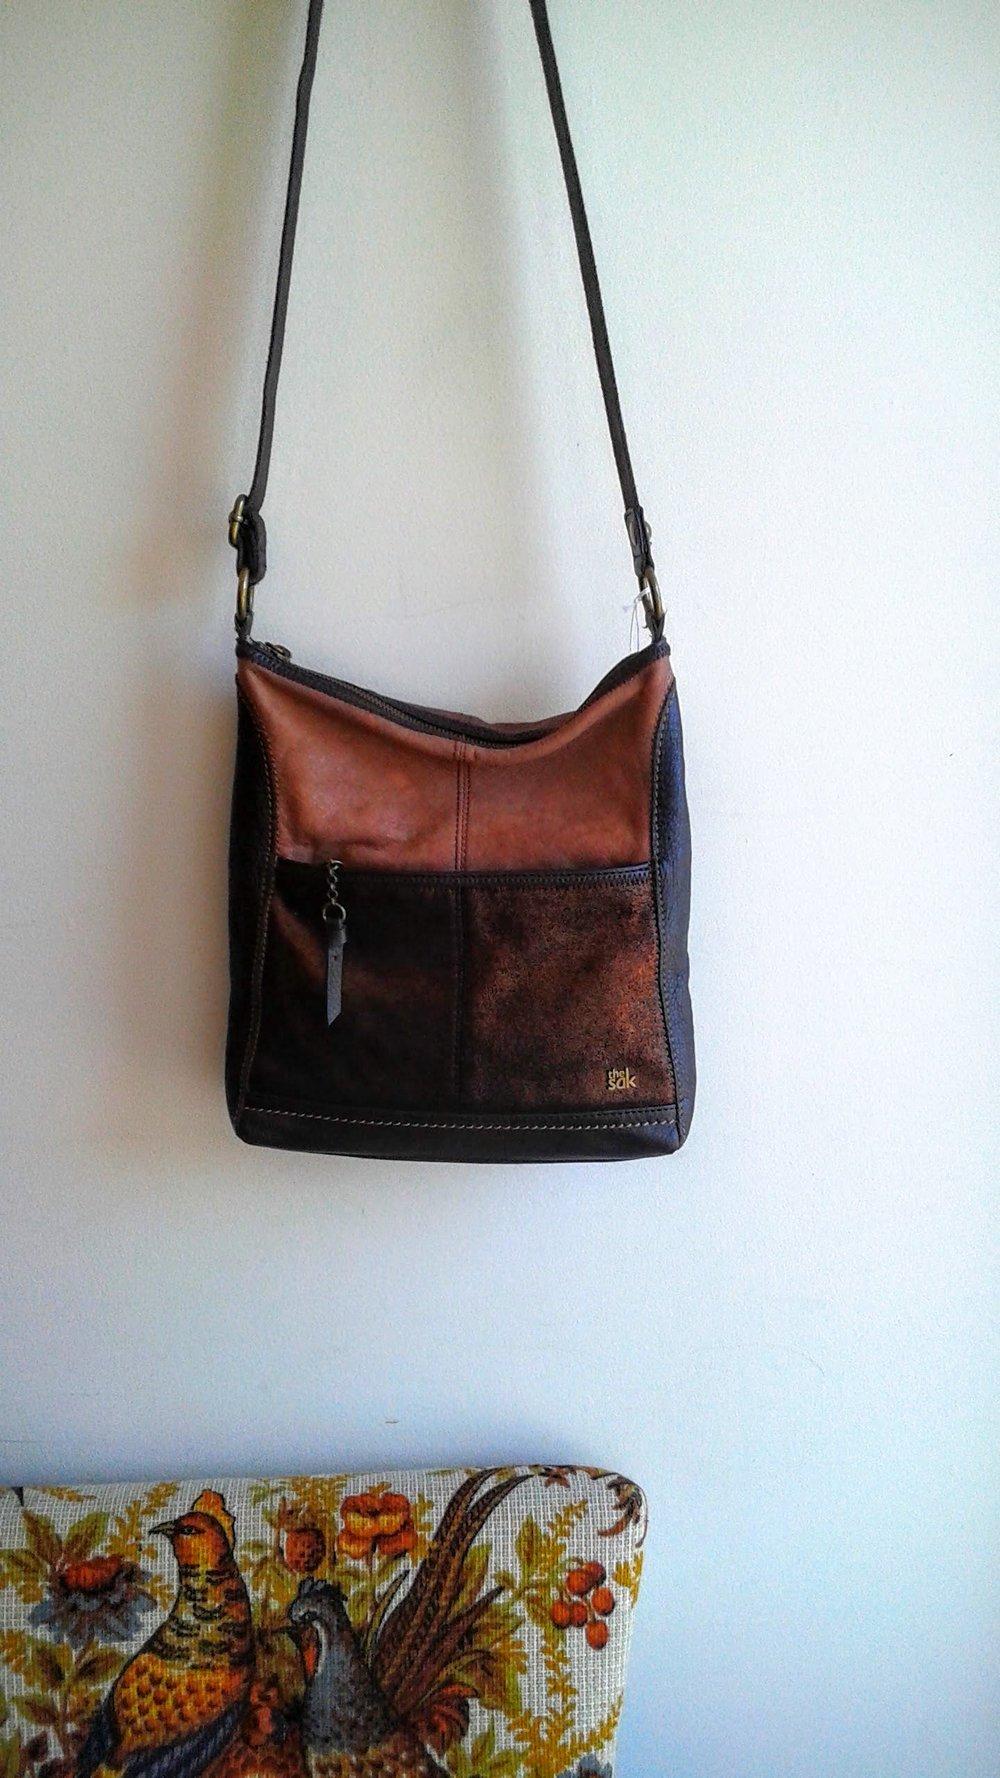 Le Sak purse, $52